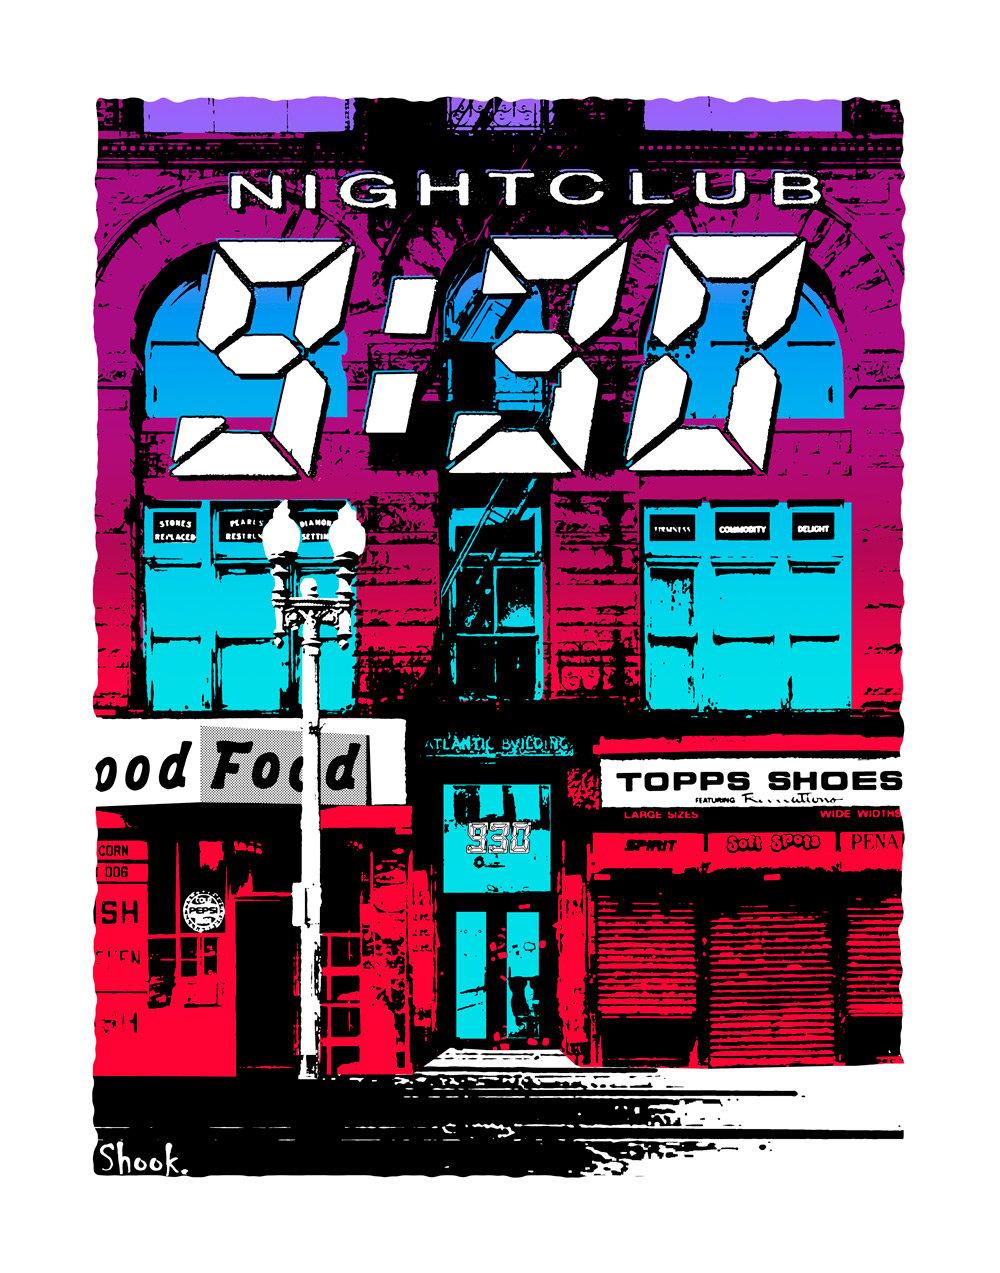 9:30 Club F Street, Washington DC Giclée Art Print (Multi-size options)